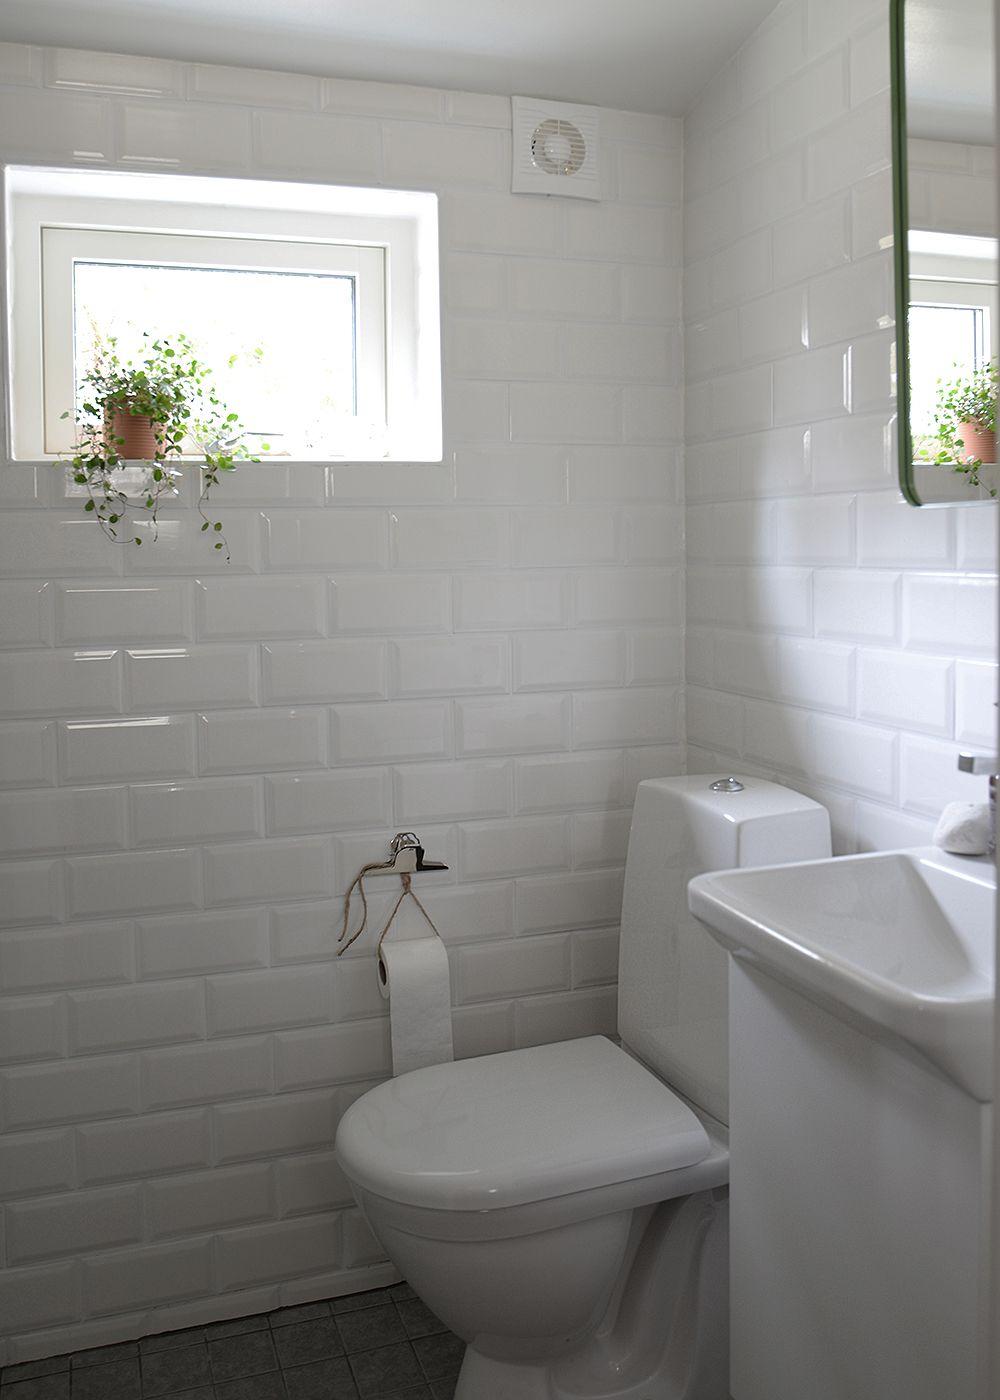 www hemtrender se www svedbergs se litet badrum, små badrum, svedberg, handfat forma i litet